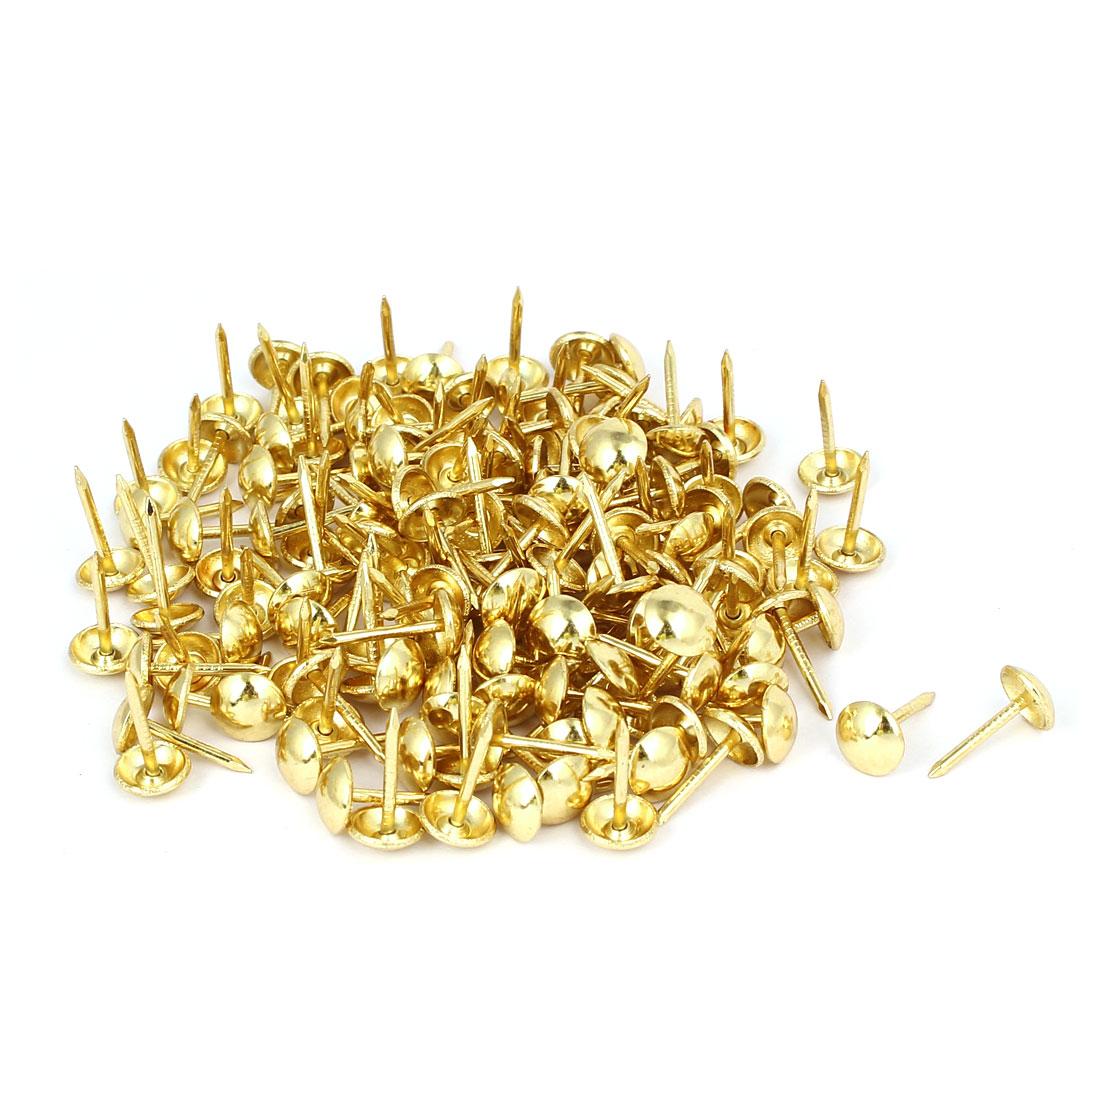 Home Furniture Upholstery Thumb Tack Nail Push Pin Gold Tone 8mm x 15mm 150pcs